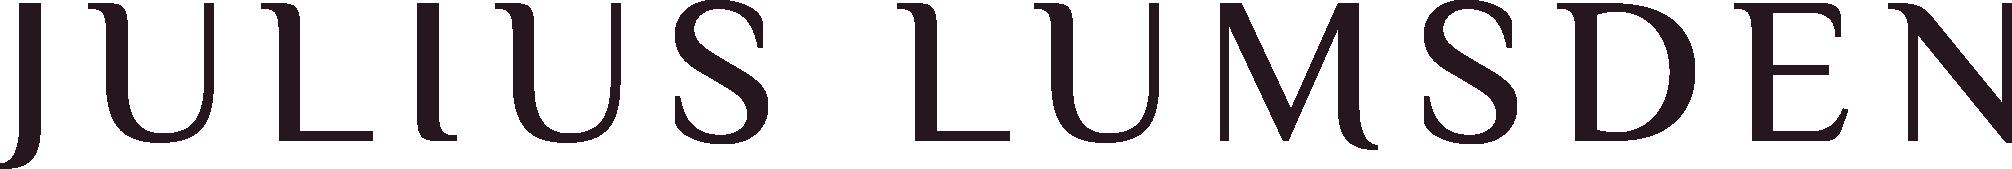 Fashion brand design logo creation